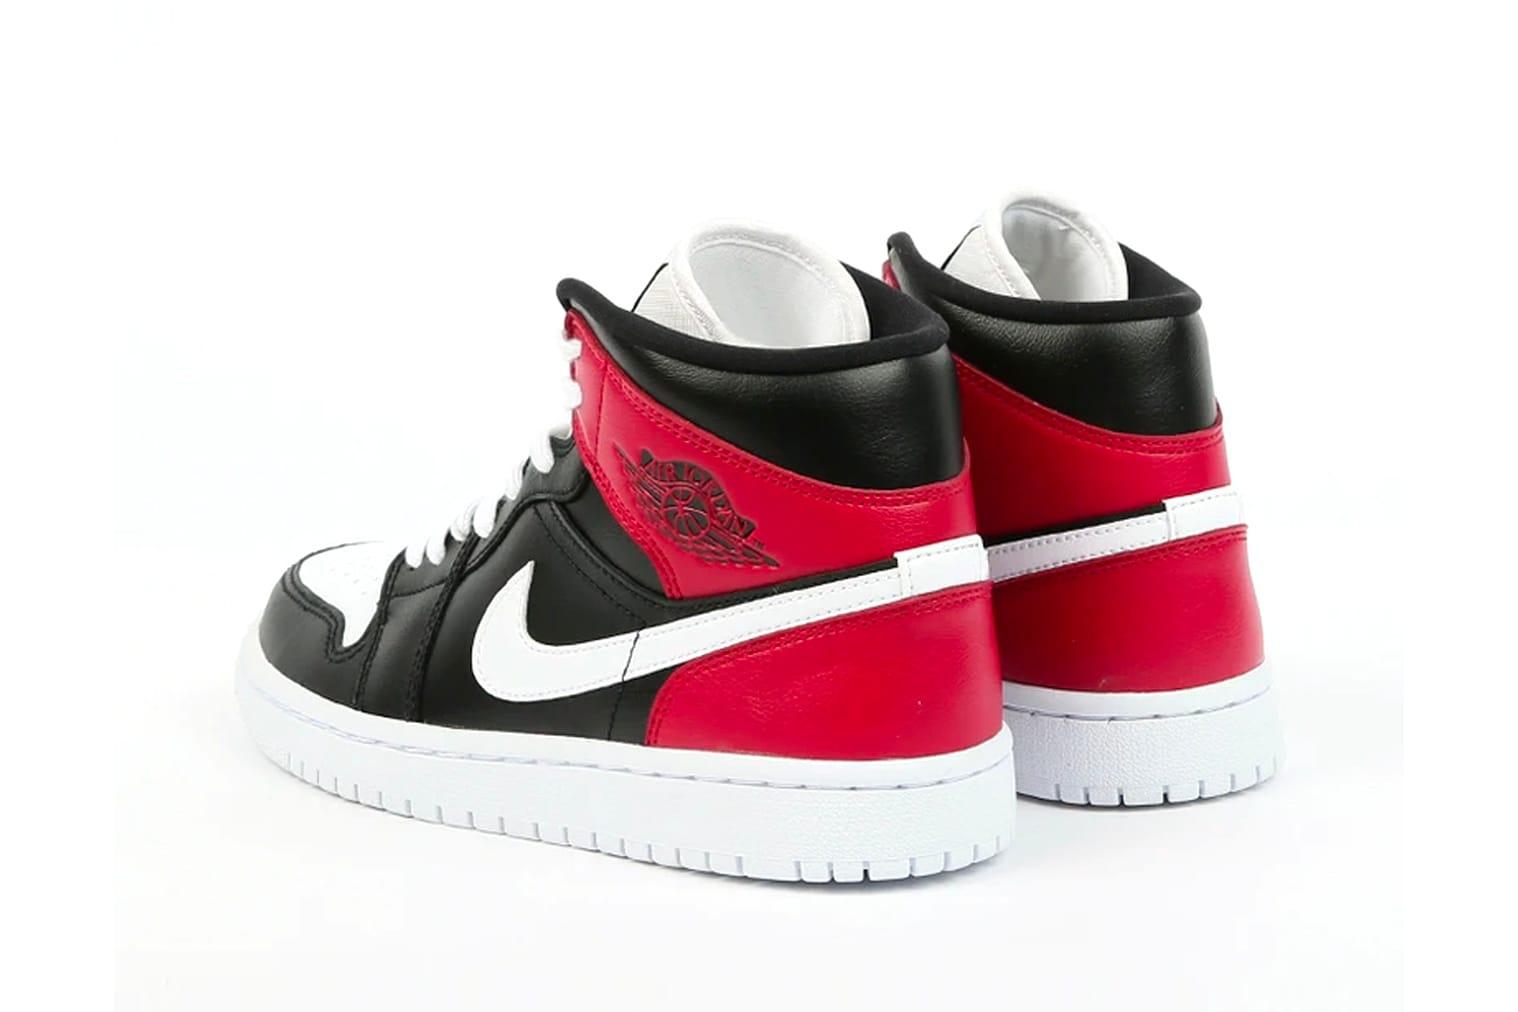 air jordans black white and red